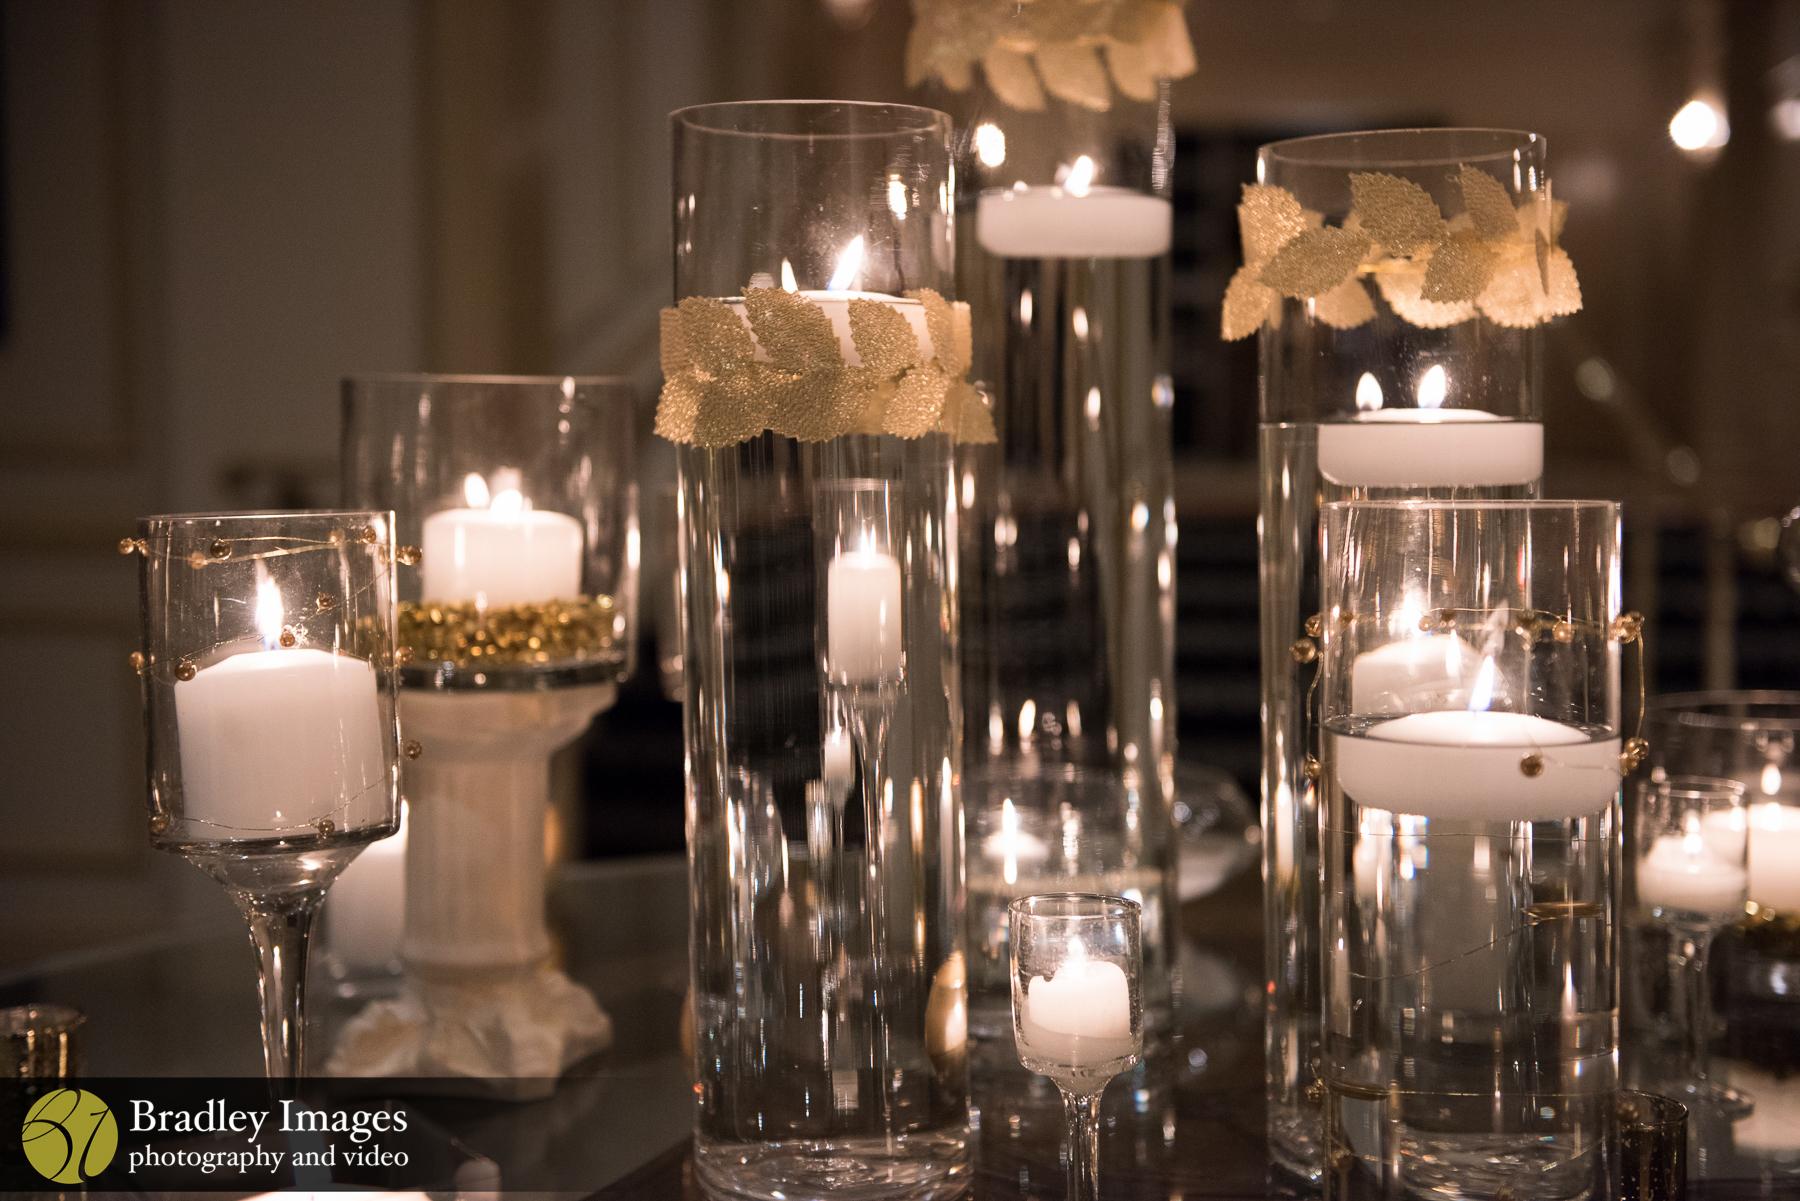 Orlinsky_Candles.jpg